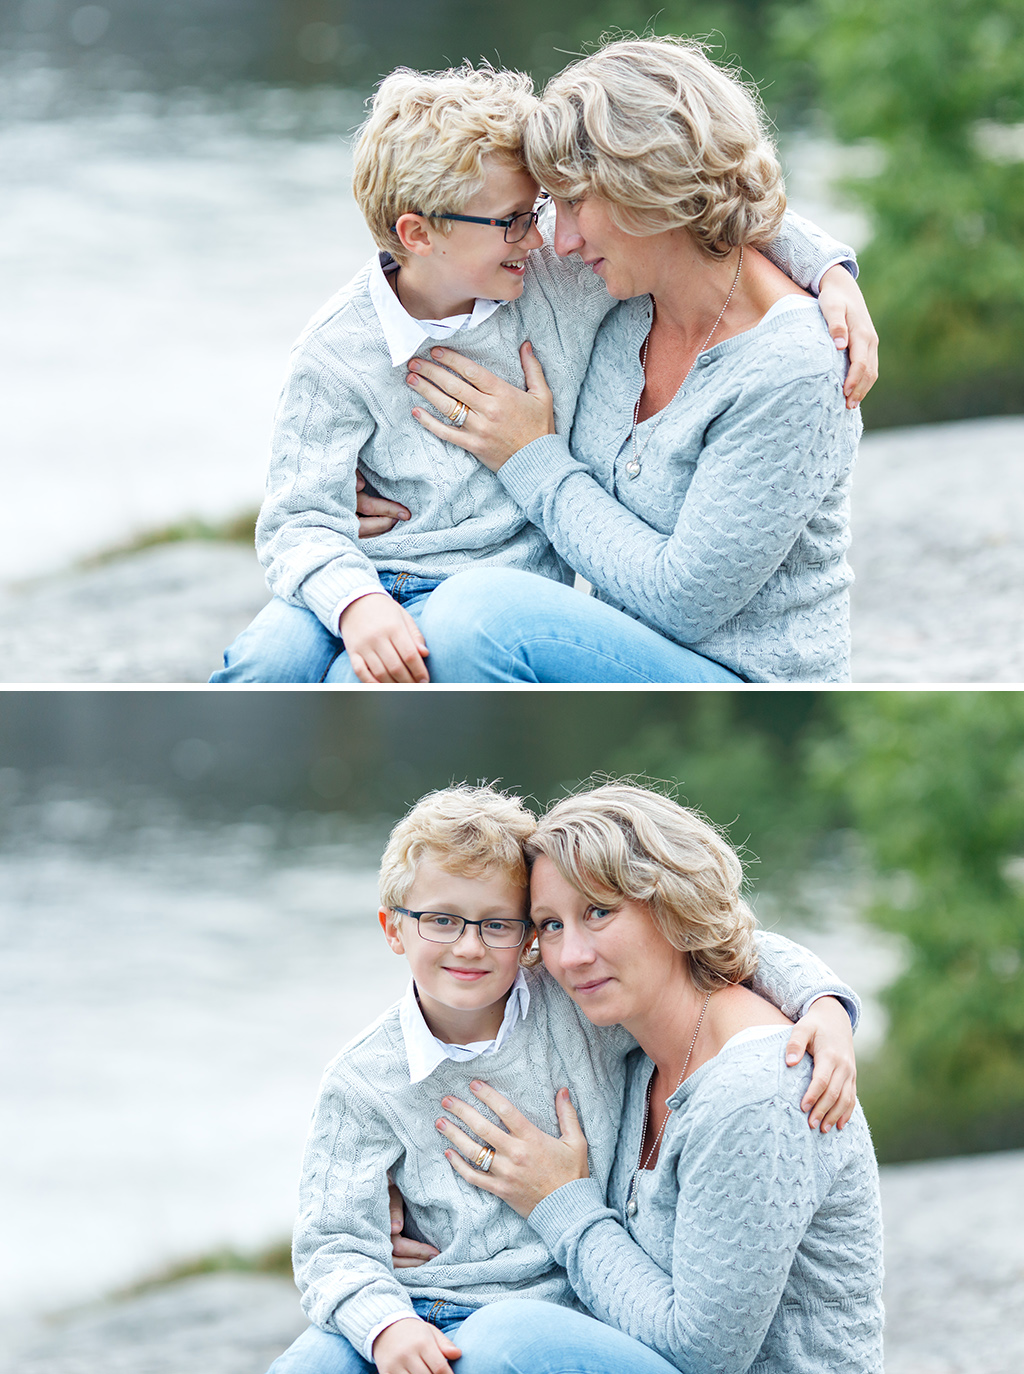 Familjefotografering_i-Stockholm_Lifestyle-familjefotograf-Anna-Sandstrom_11.jpg